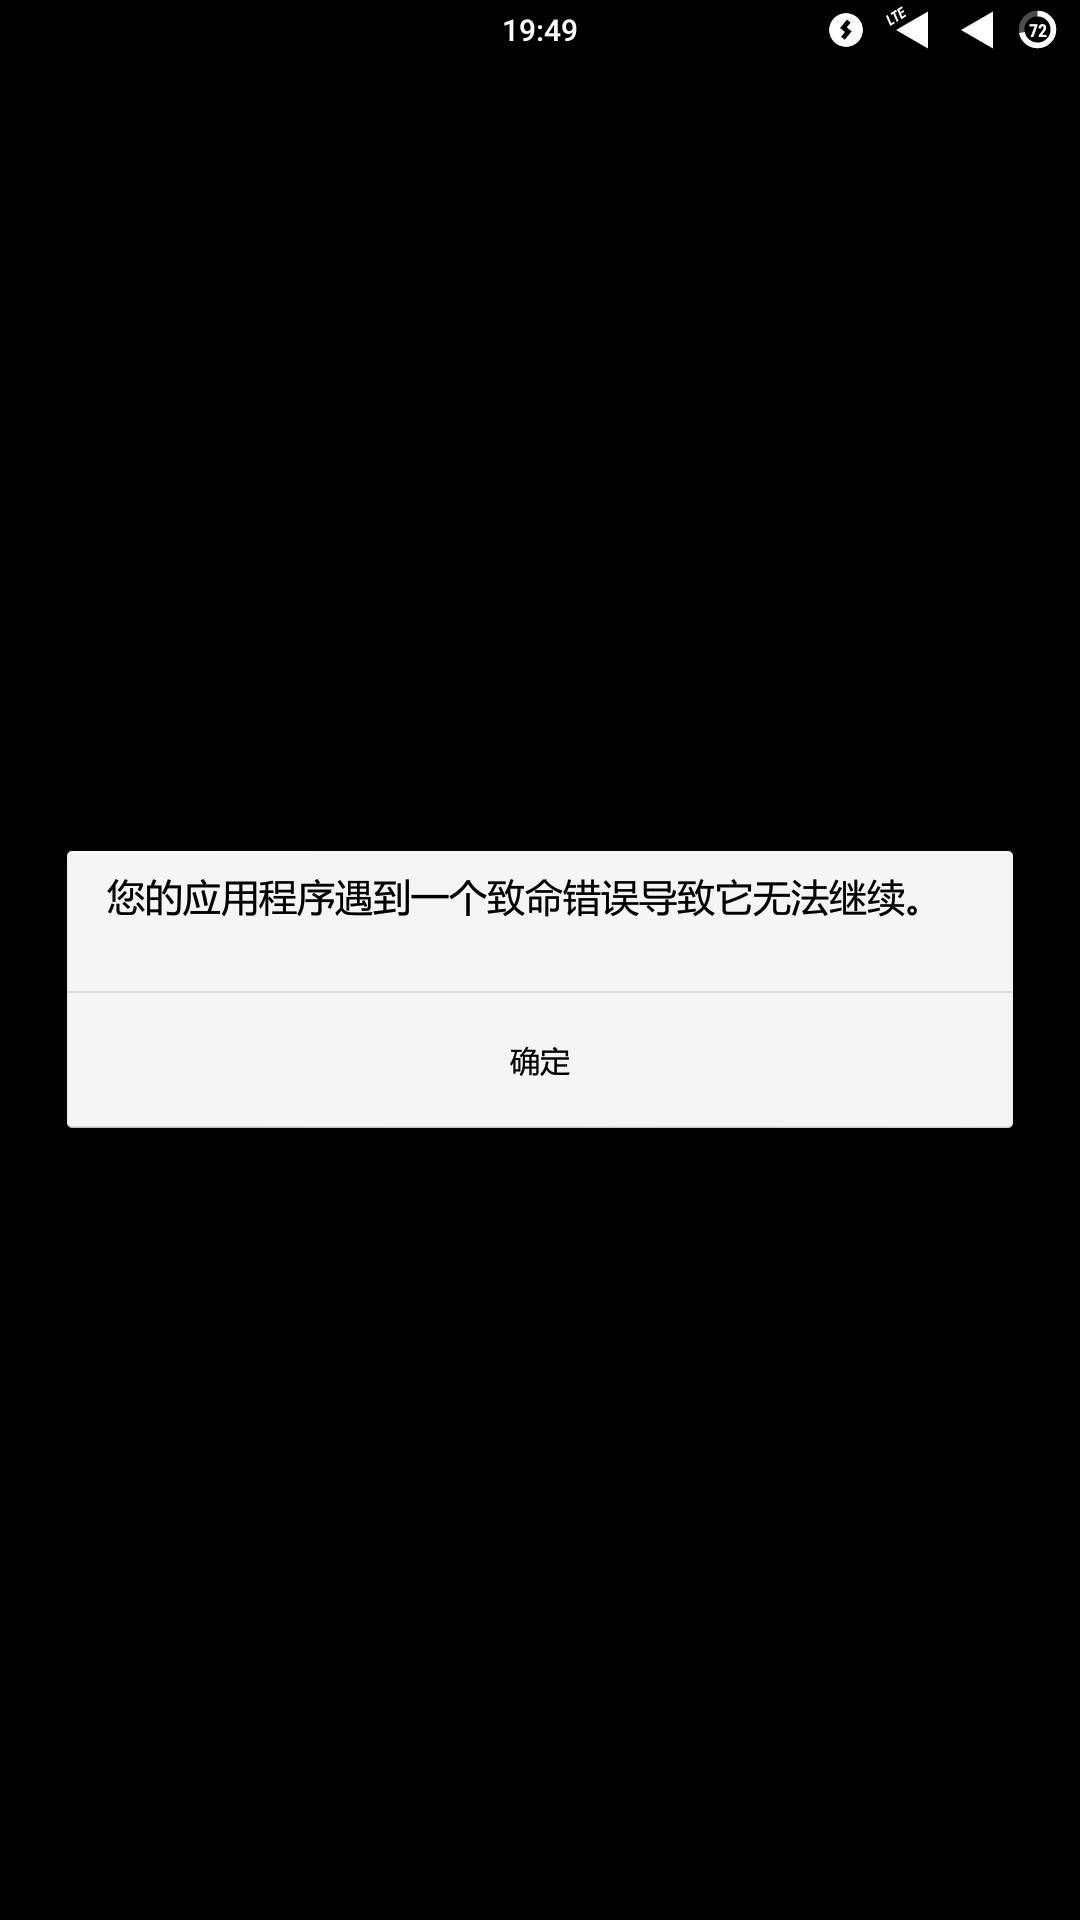 Screenshot_20160605-194936.png